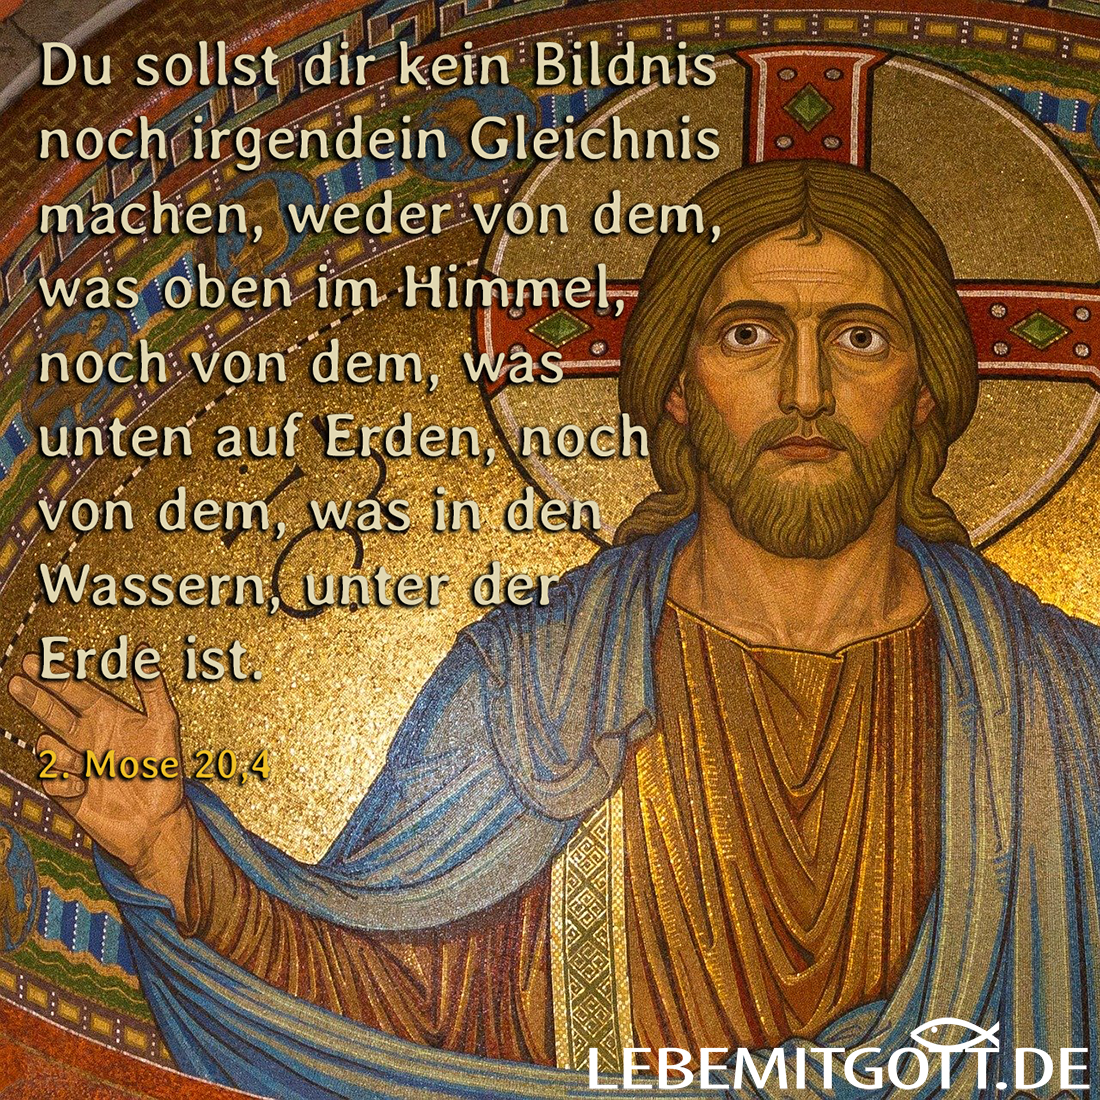 Bildnis